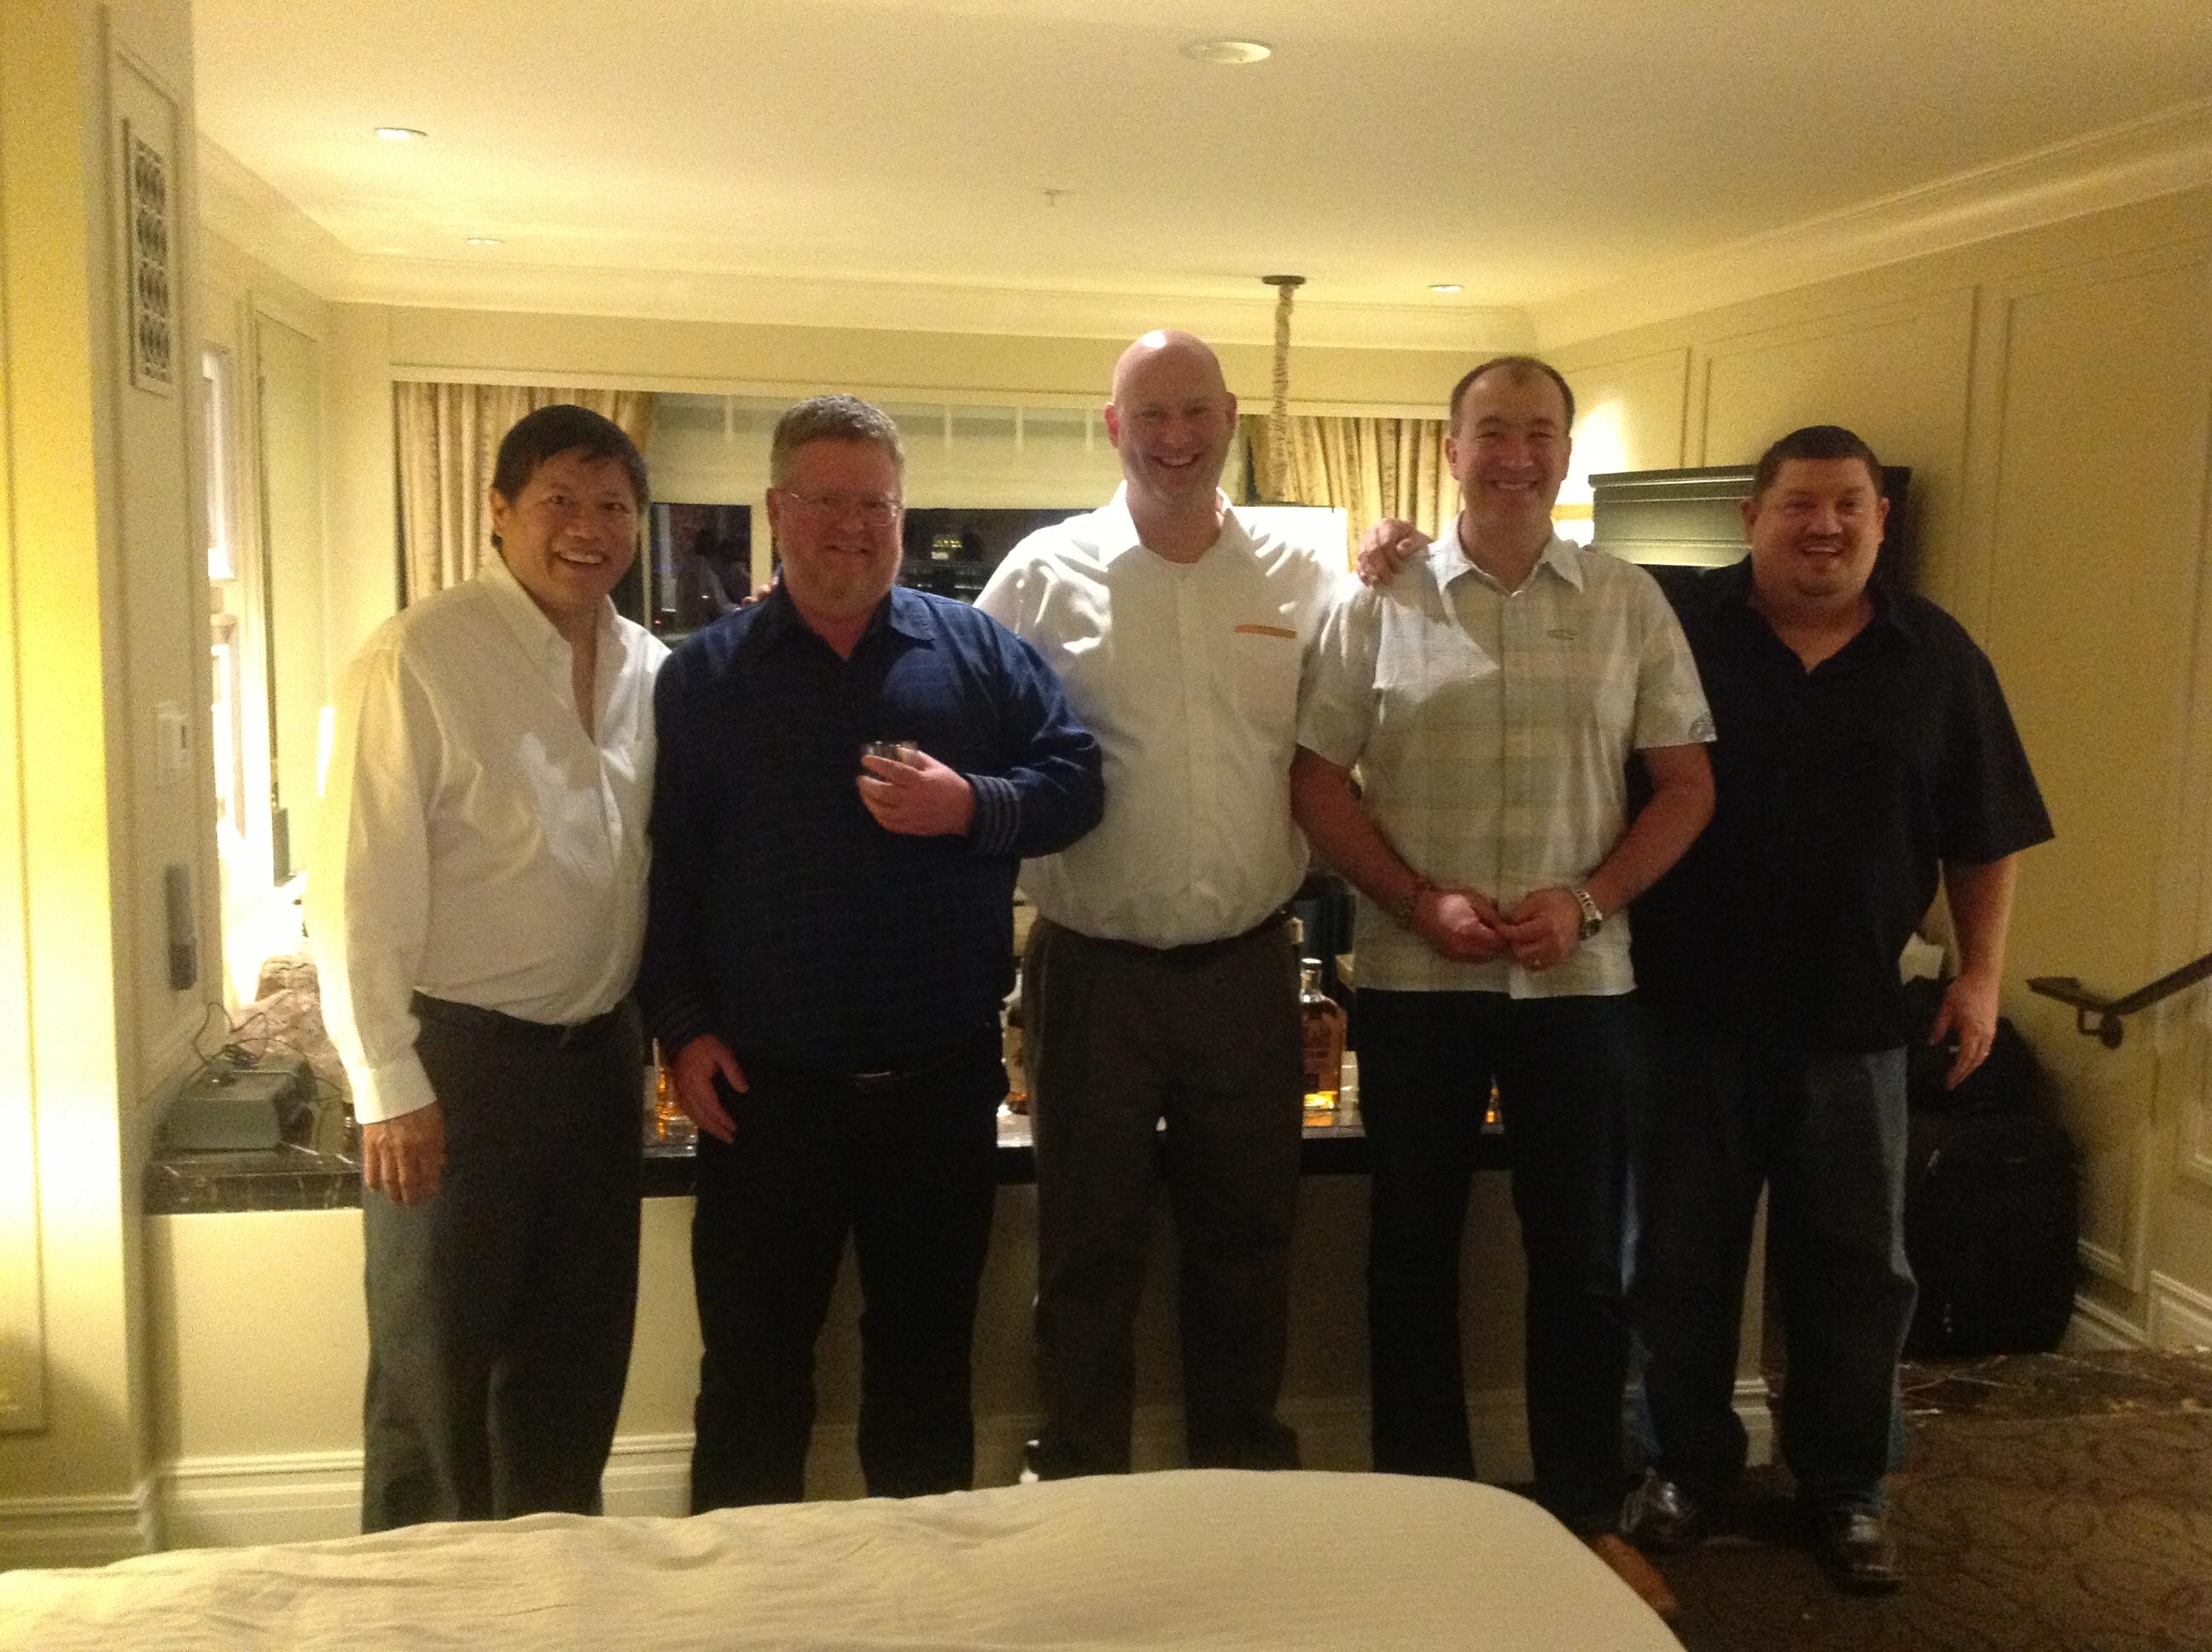 Left to Right. Wilson Mar, Scott Hysmith, James Pulley, Richard Bishop, Scott Moore